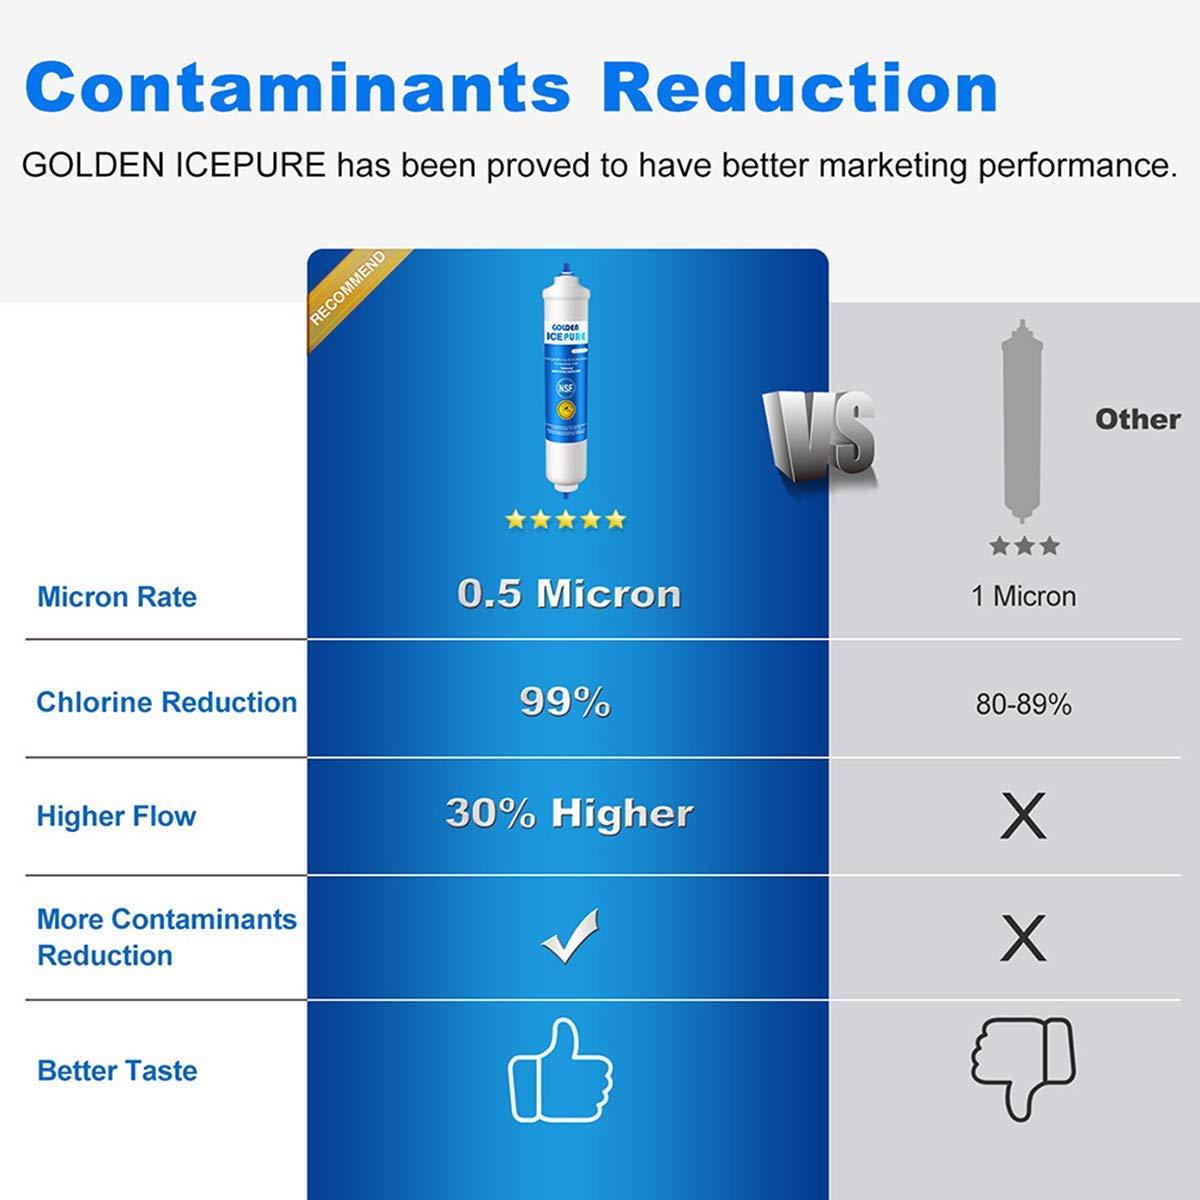 DA99 02131B EF9603 DA29-10105J HAFEX//EXP WSF-100 GOLDEN ICEPURE 2 pacco Sostituzione filtro acqua Frigorifero per Samsung DA29-10105J